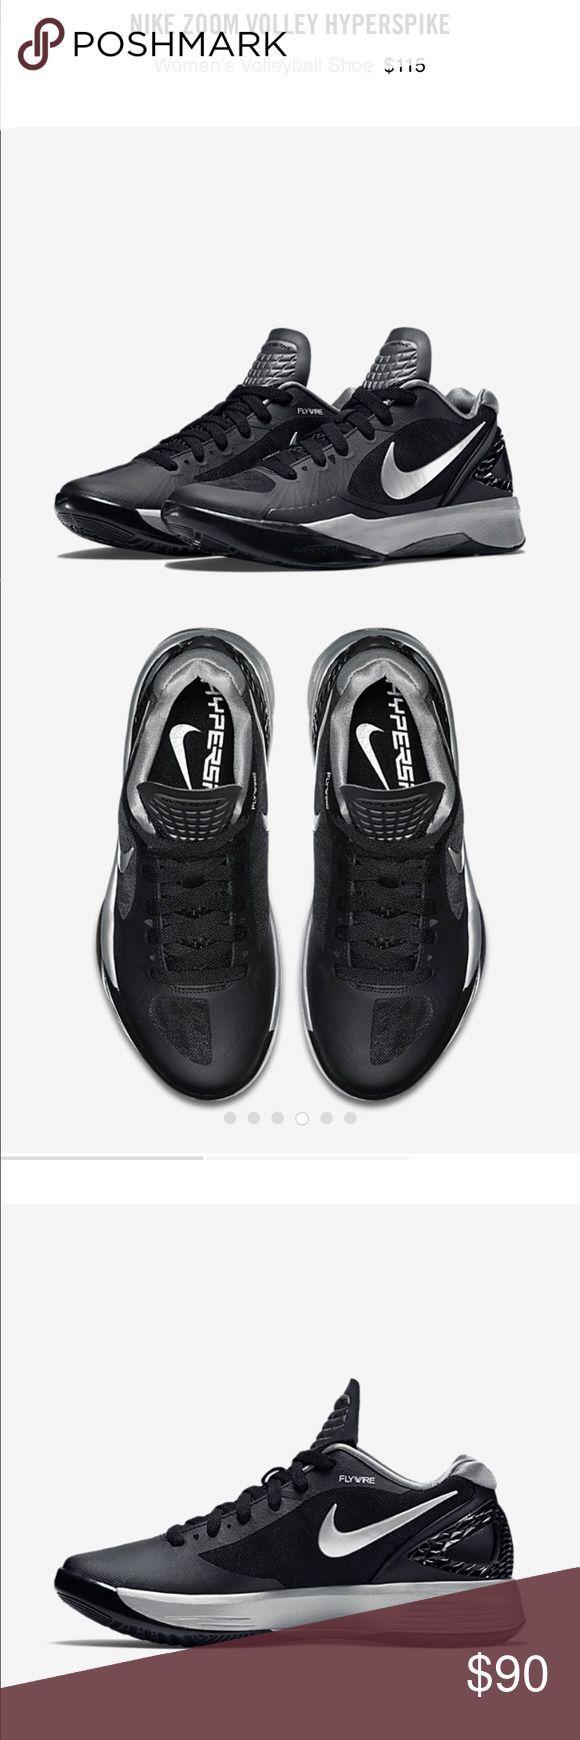 Nwt Nike Volleyballschuhe Nwt Und In Box Damen Nike Volley Zoom Hyperspik Fashionaccessories Fashioninfluencer Nike Volleyball Shoes Volleyball Shoes Shoes